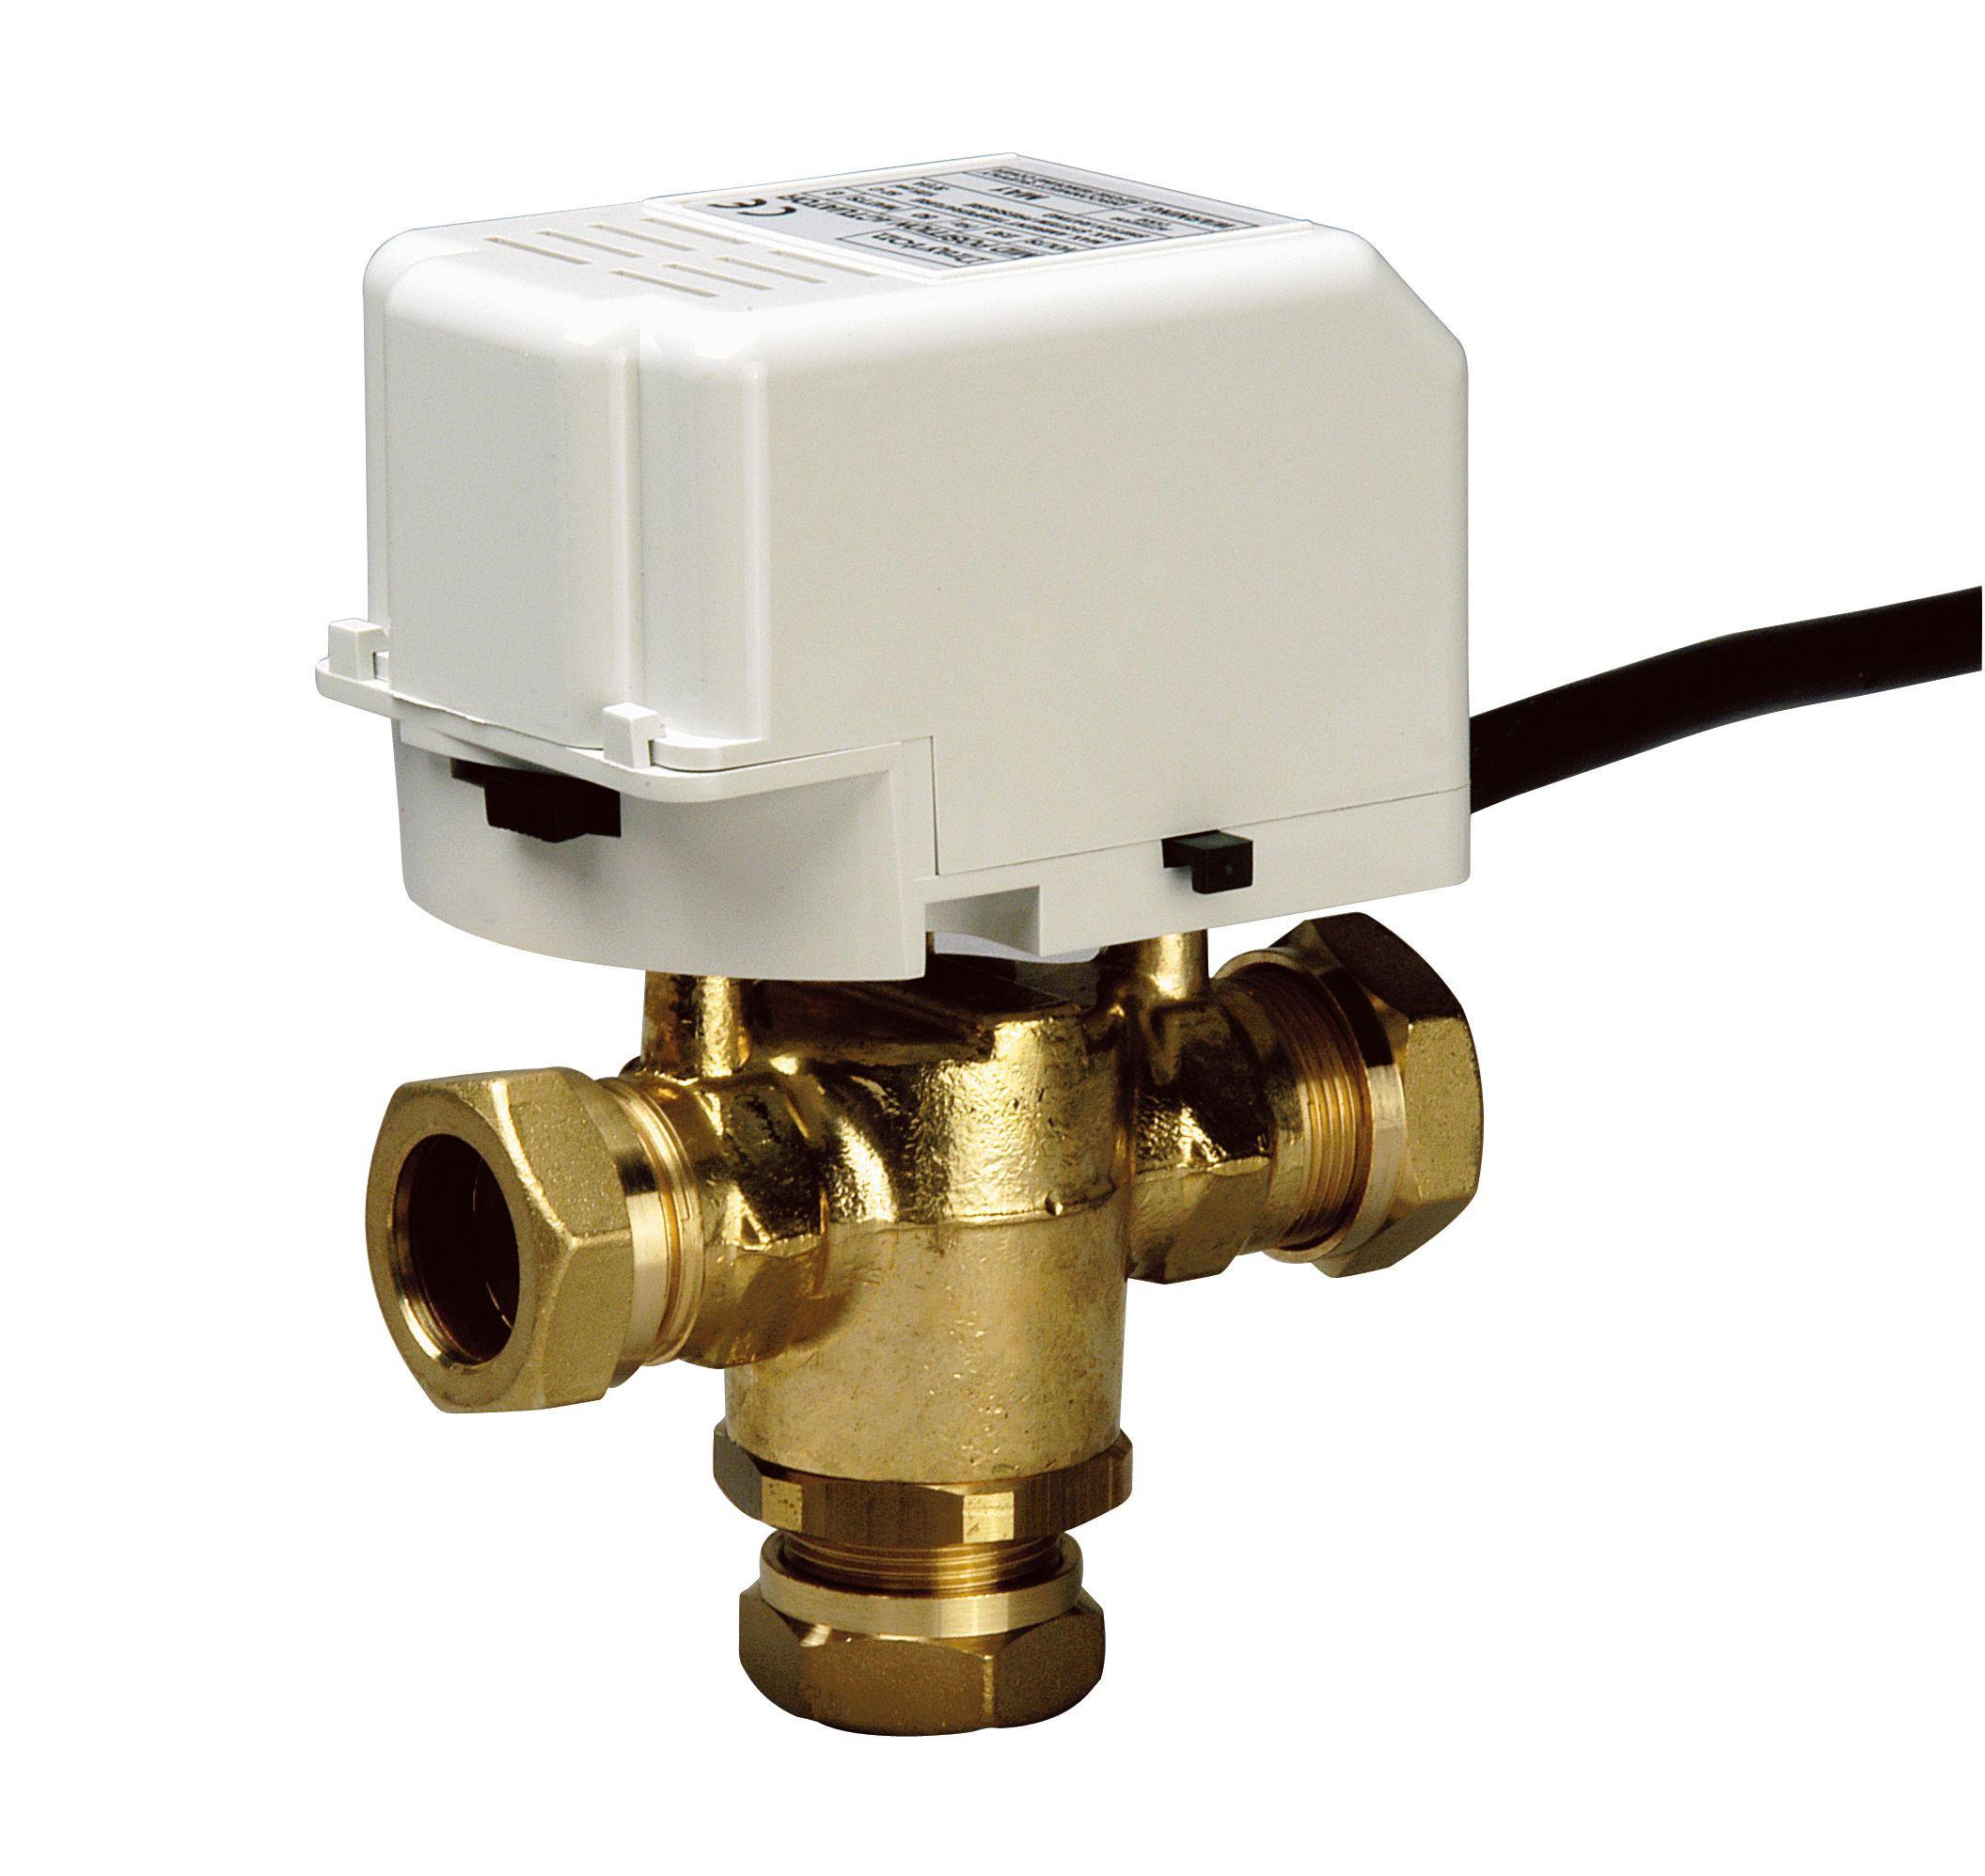 switchmaster mid position valve wiring diagram 1992 dodge dakota headlight drayton compression dia 22mm departments diy at b andq